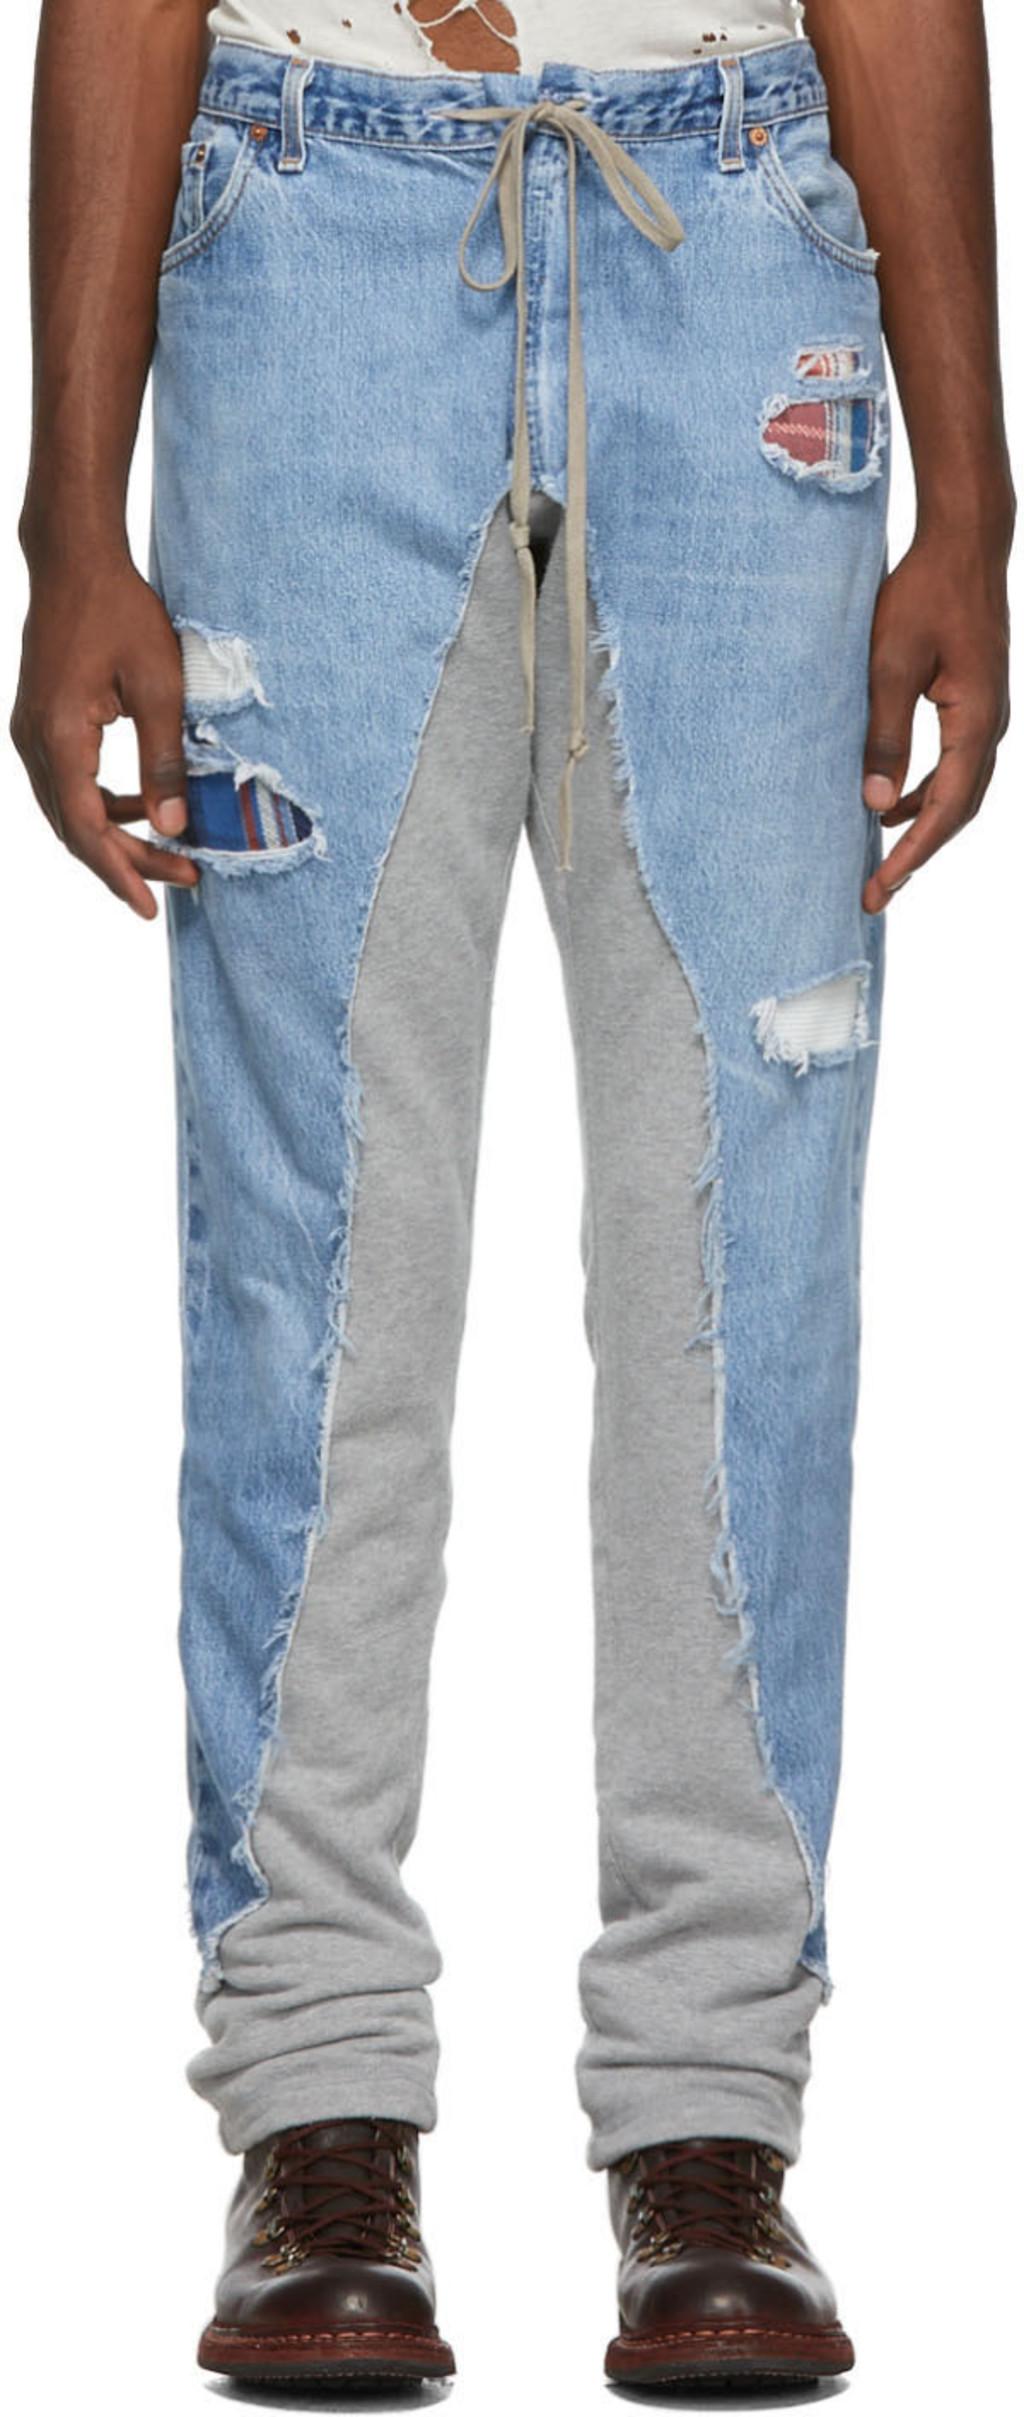 ed013c5b Blue & Grey 50/50 Denim/Terry Jeans